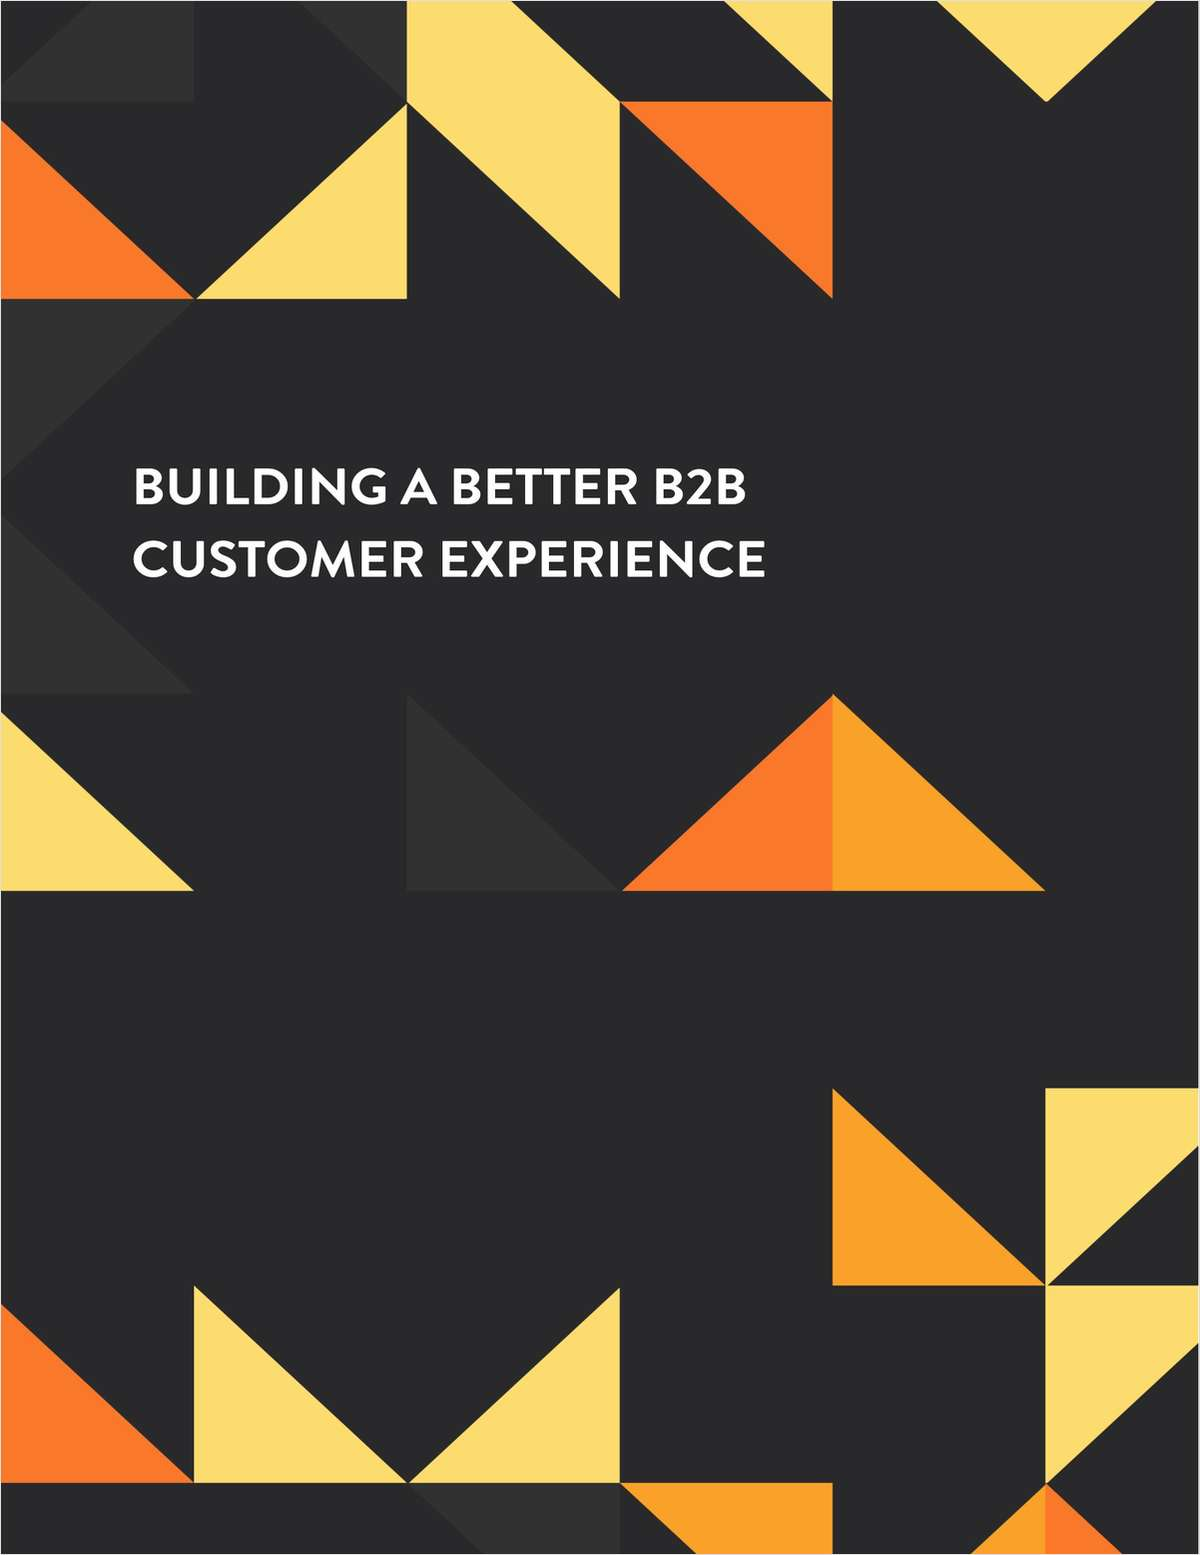 Building a Better B2B Customer Experience